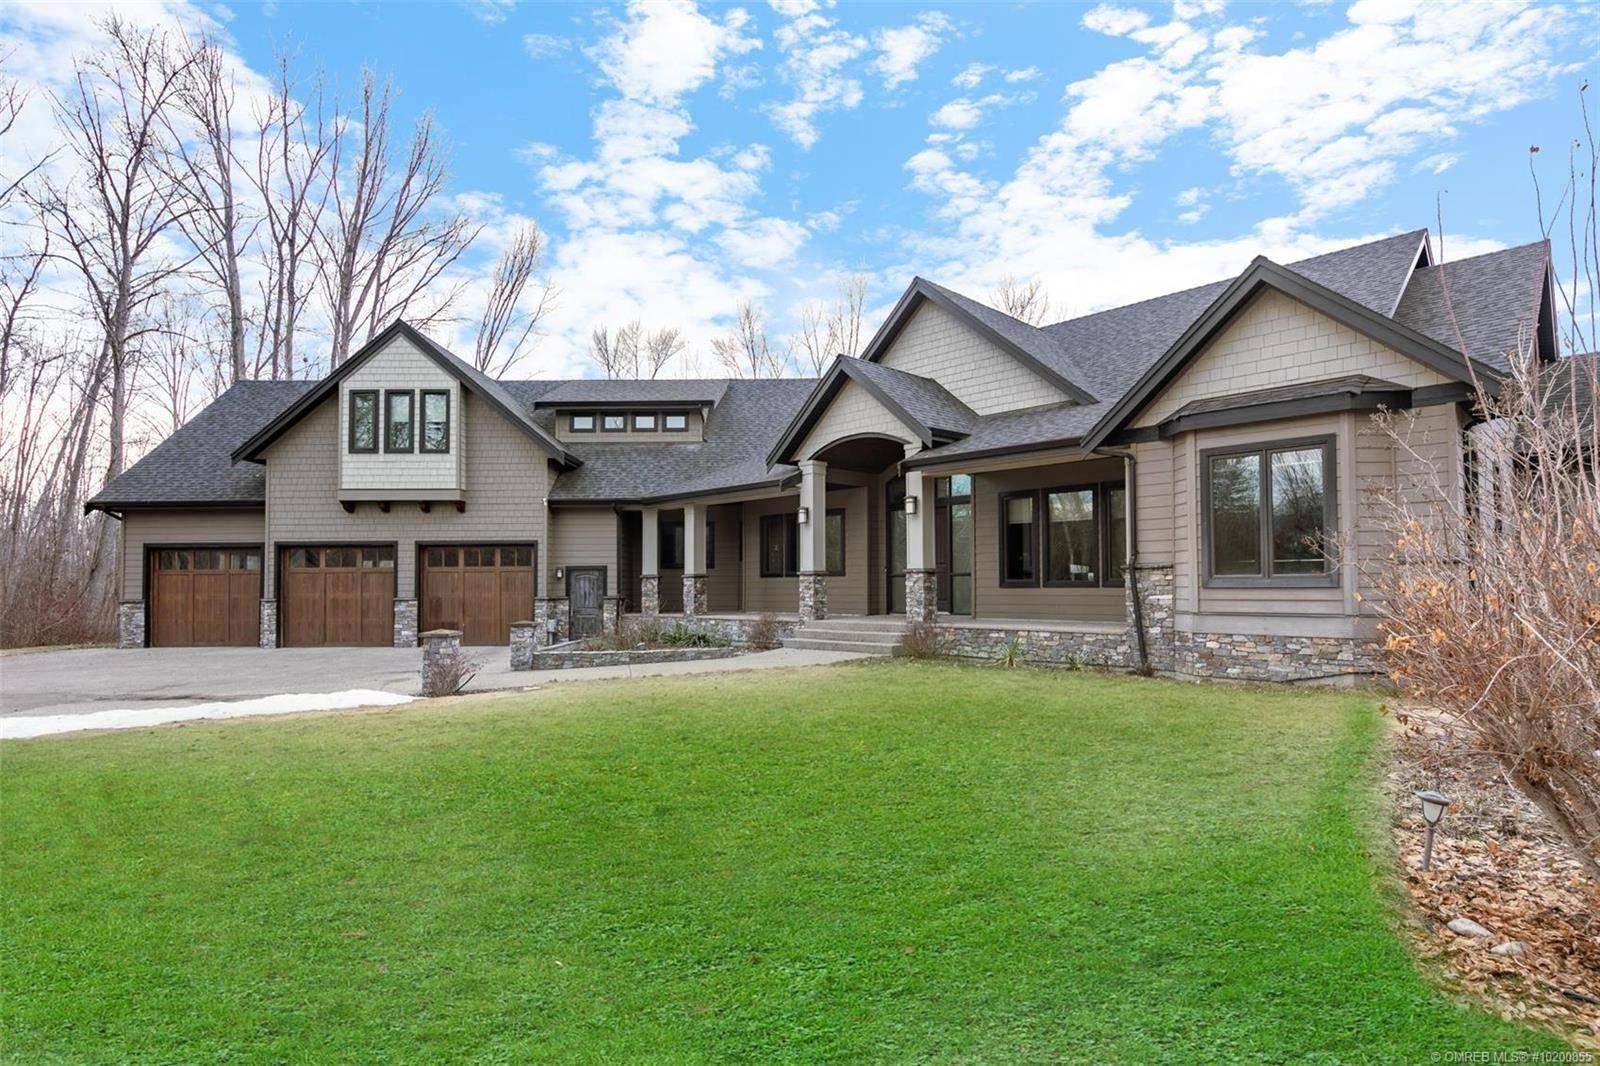 House for sale at 3280 Wildwood Rd Kelowna British Columbia - MLS: 10200855